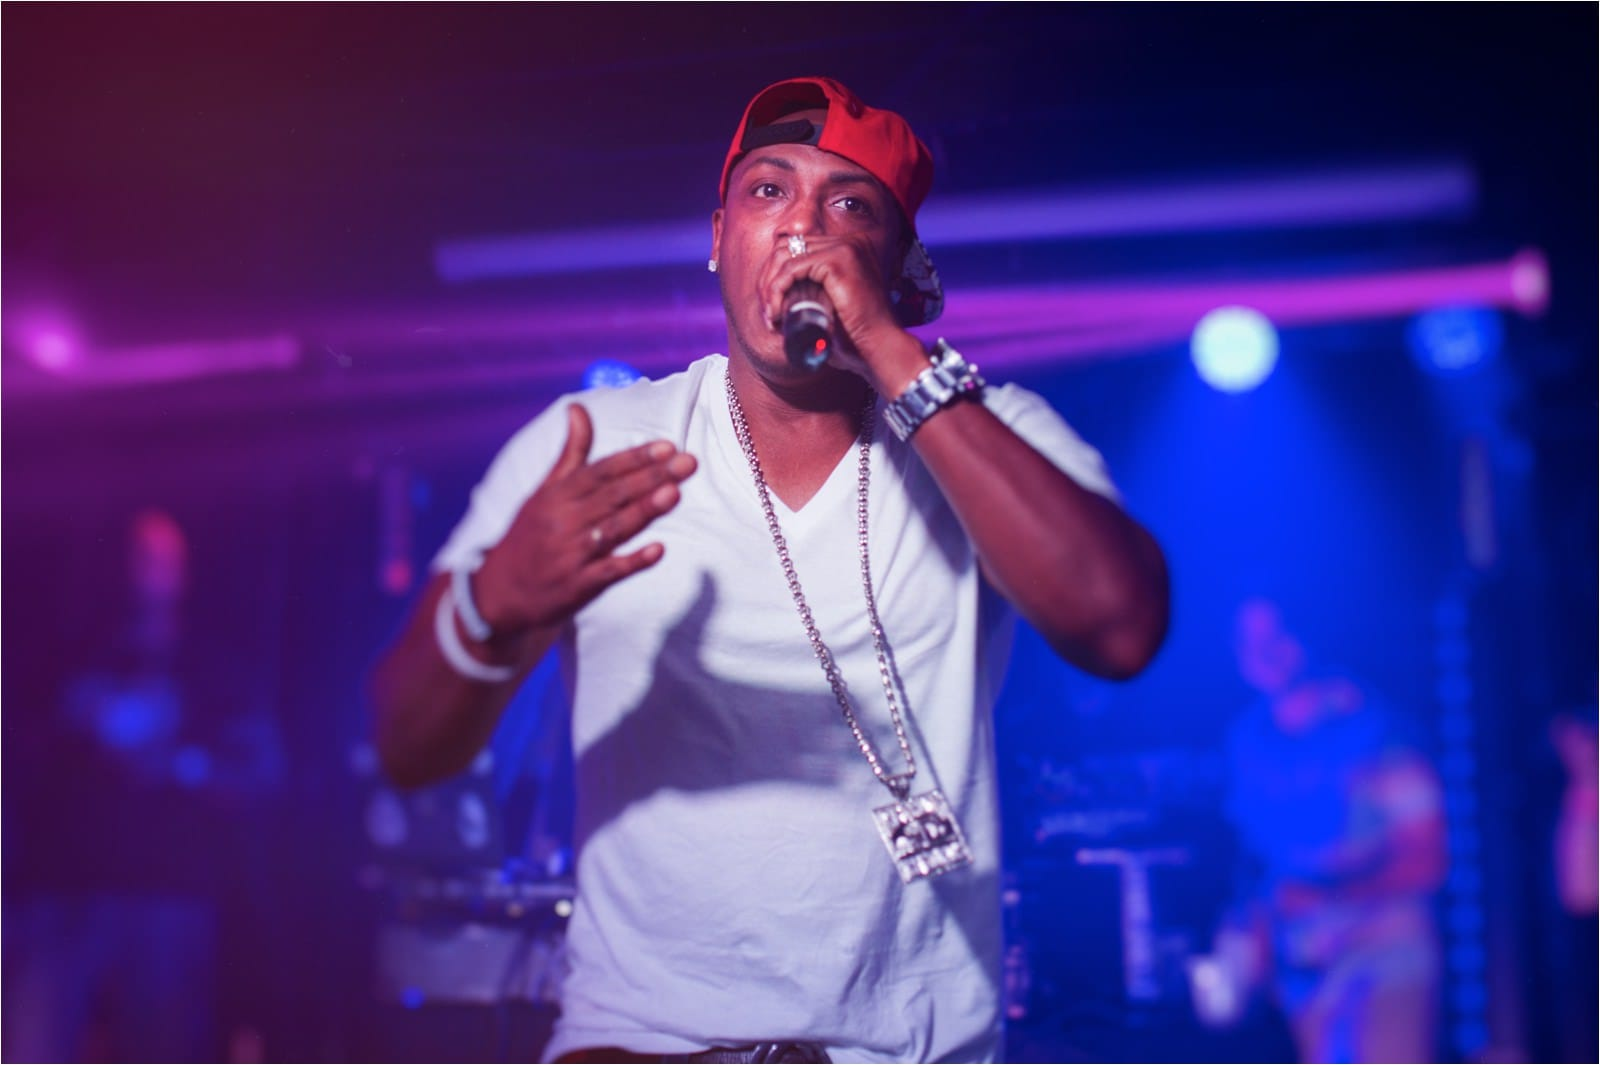 New Orleans Rapper Mystikal - Dark Roux | New Orleans